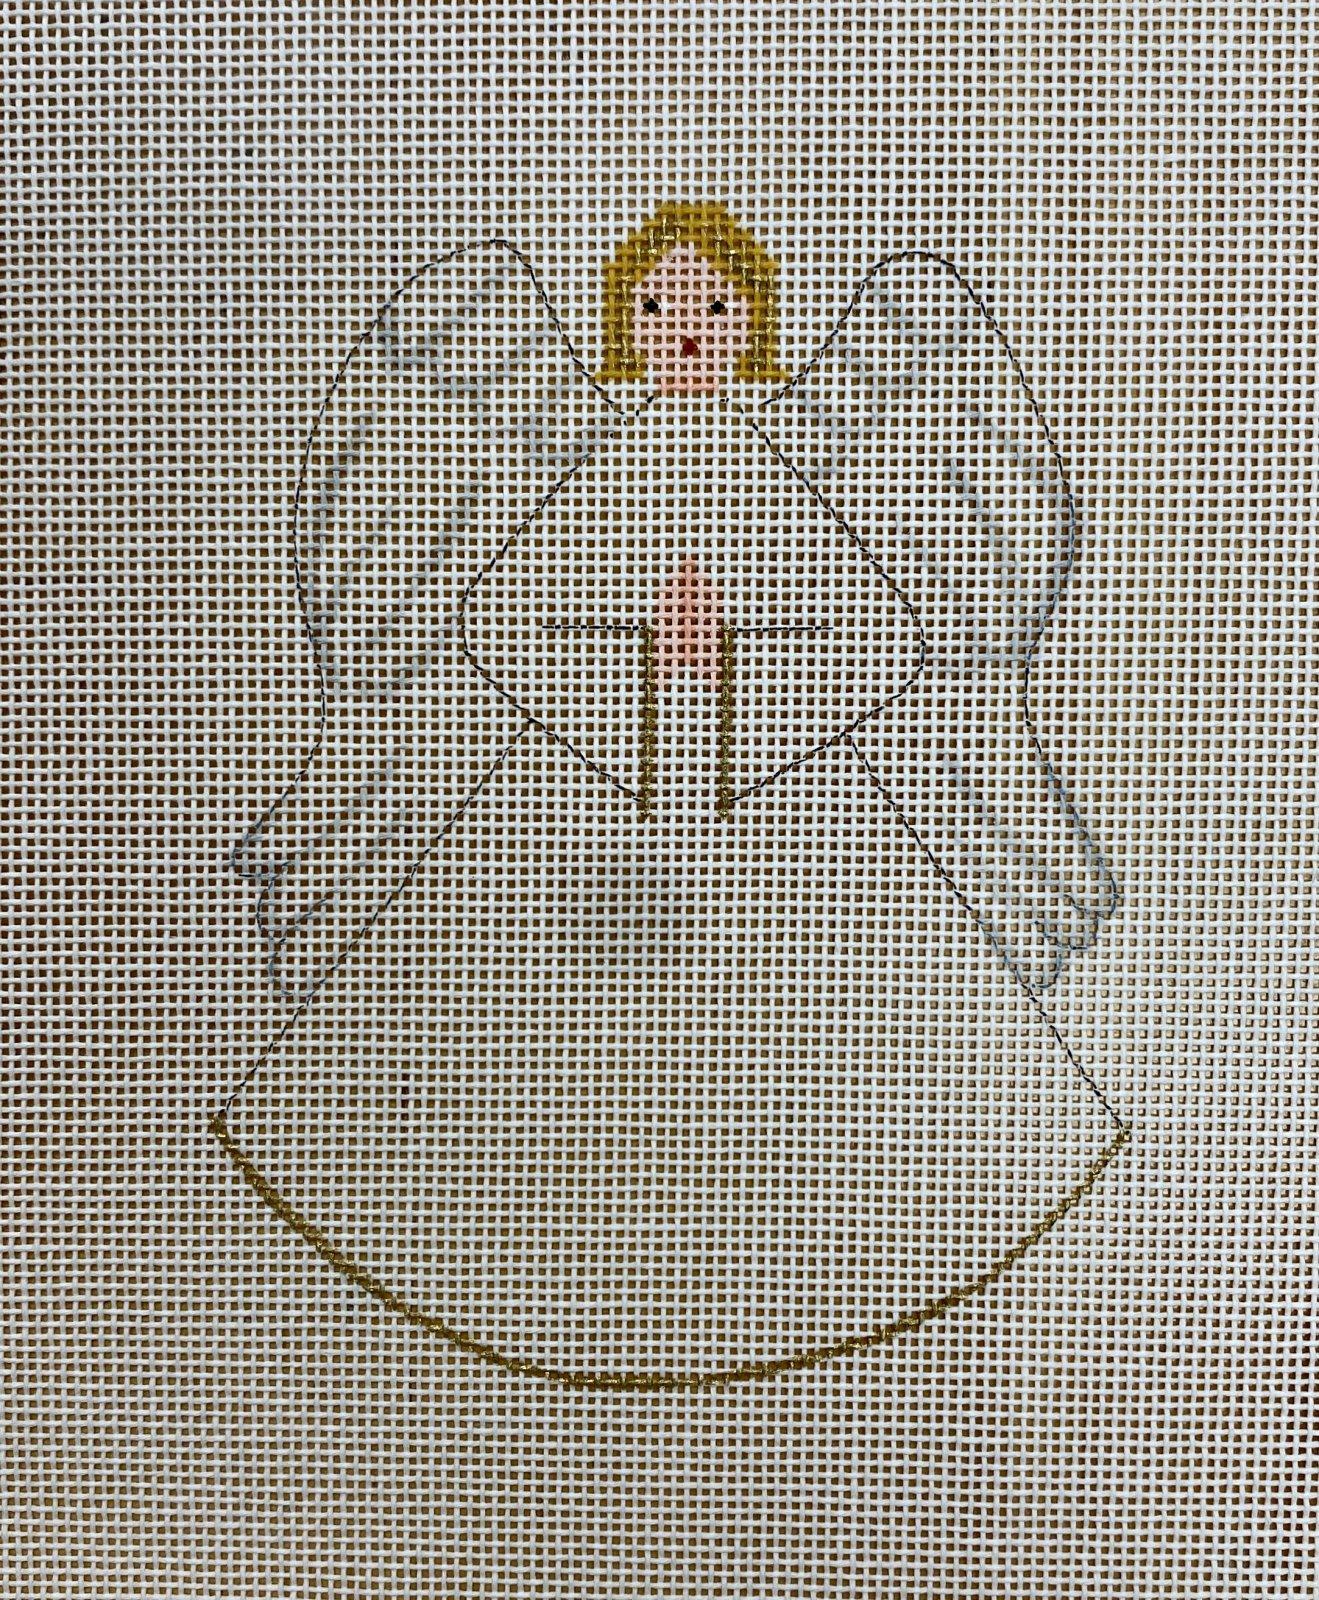 company of angels, praying w stitch guide